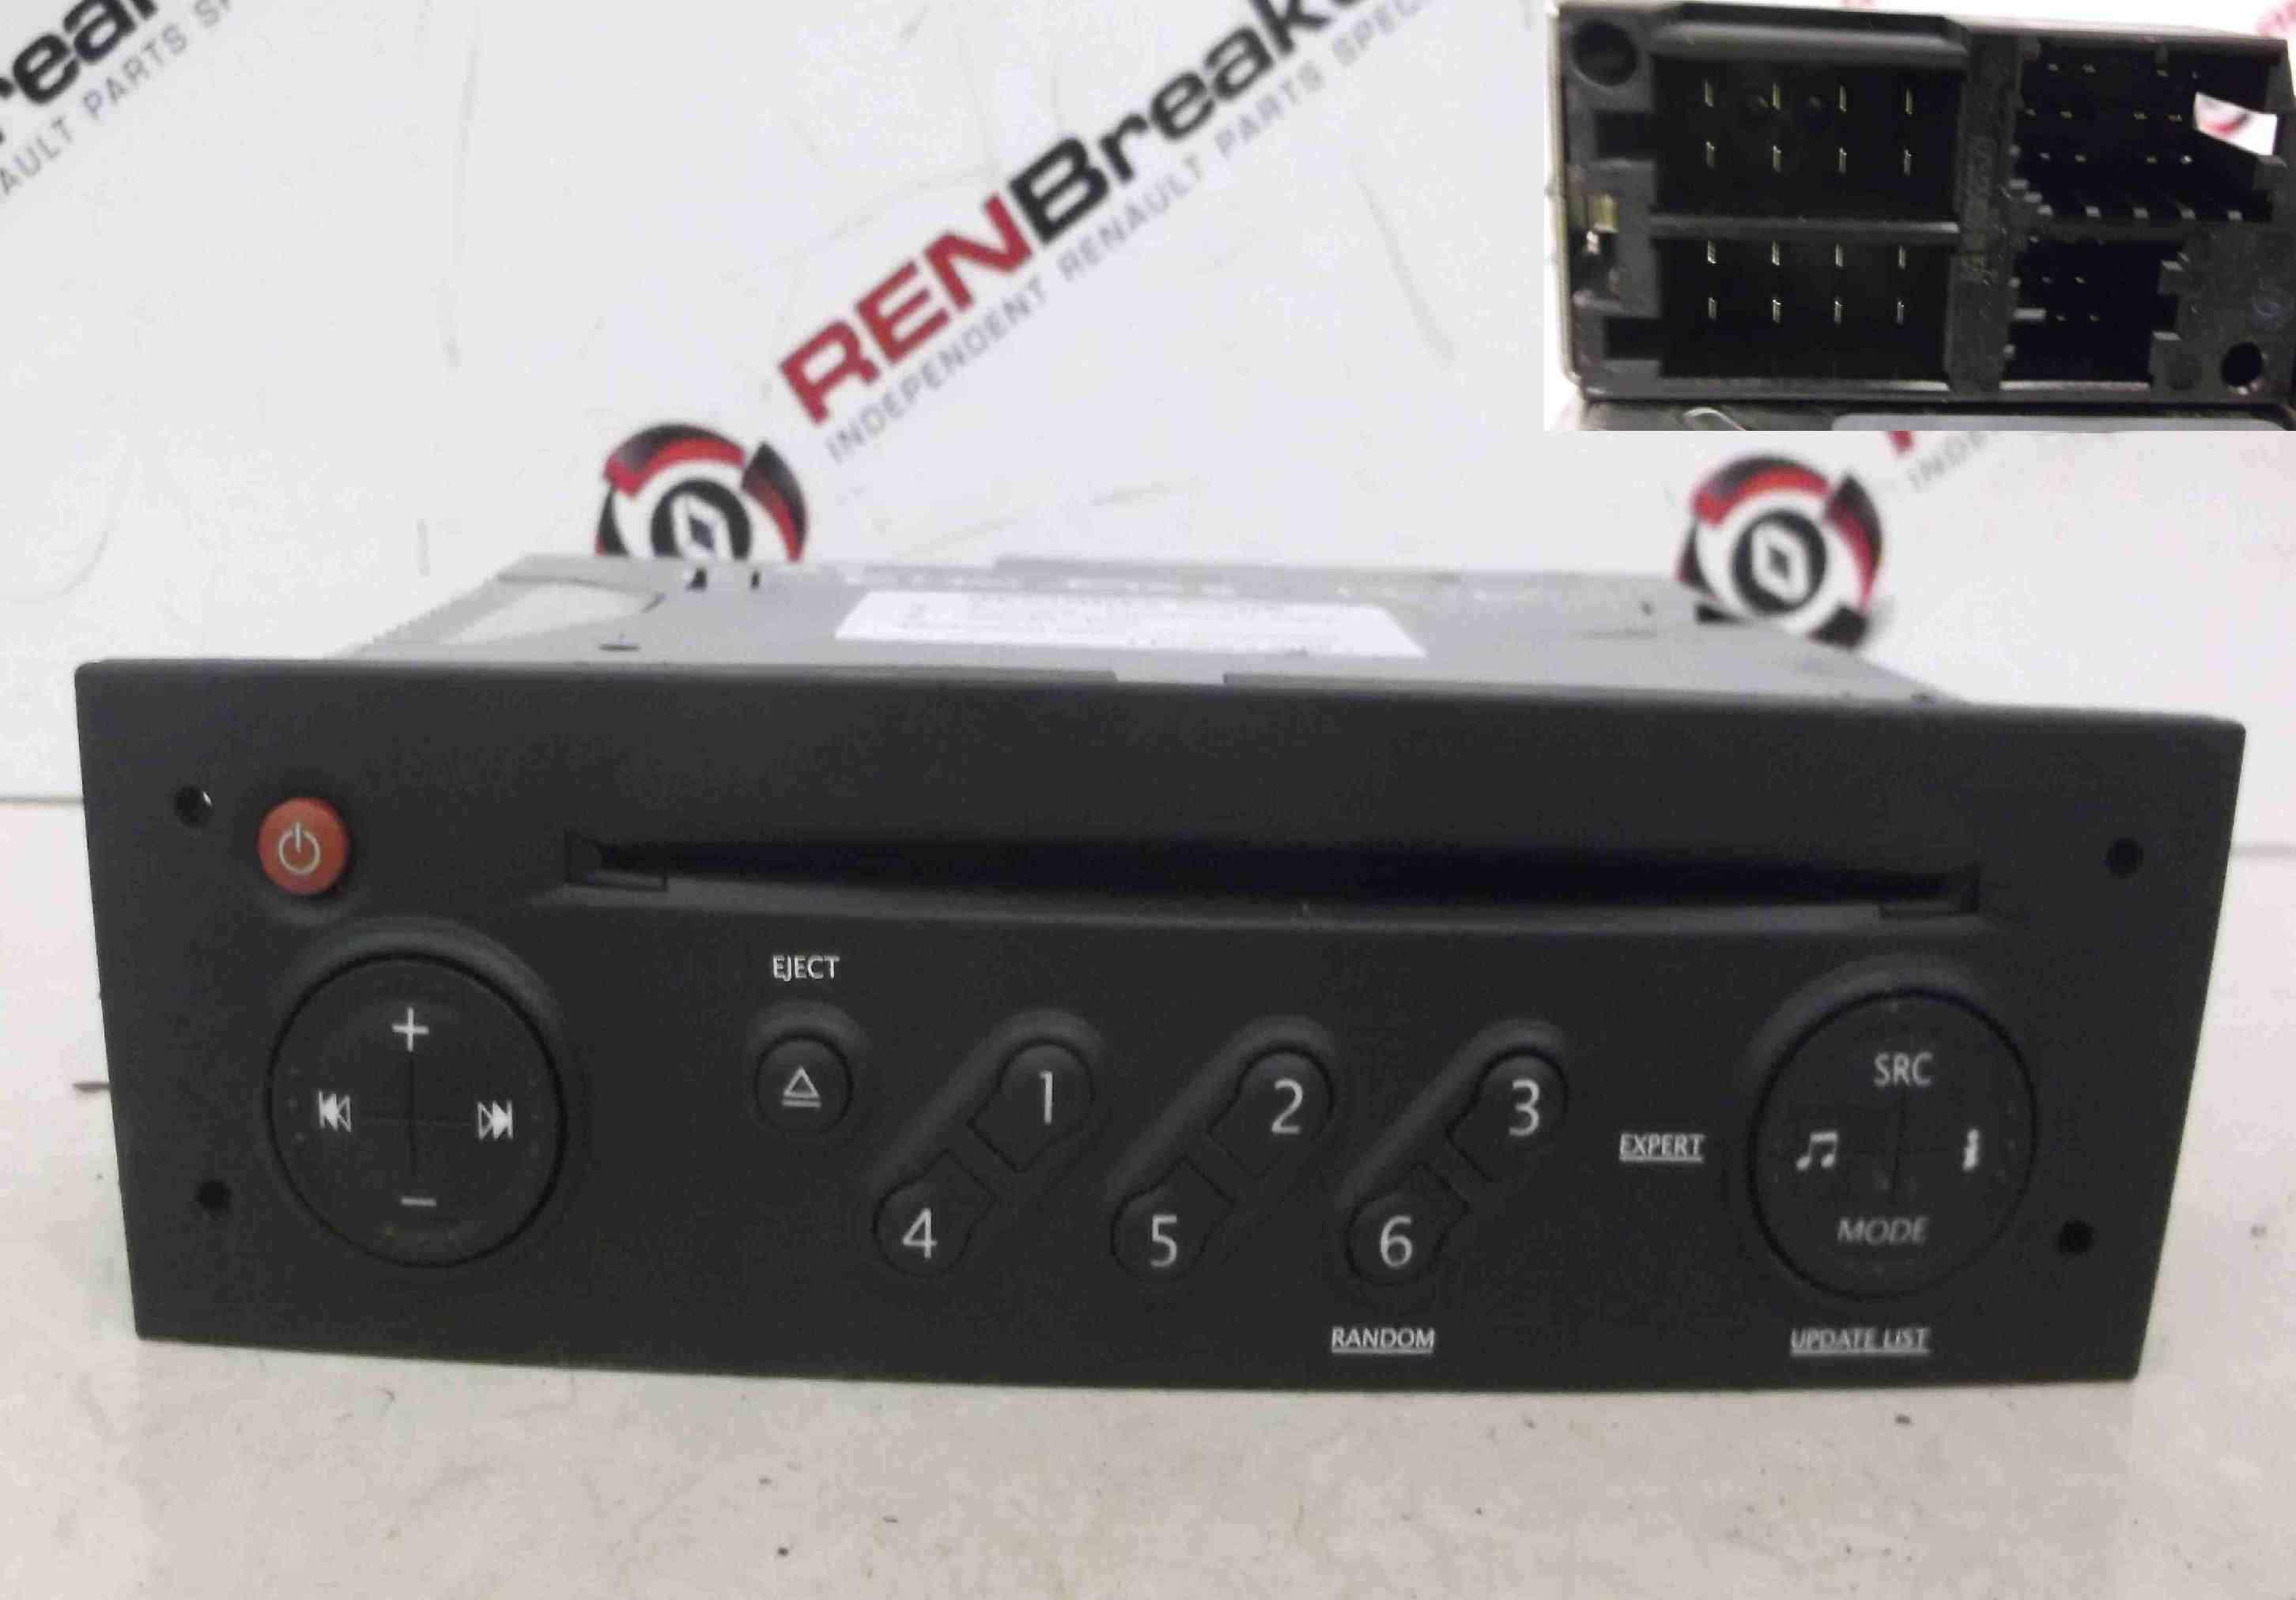 renault clio mk3 2005 2009 cd player radio update list code. Black Bedroom Furniture Sets. Home Design Ideas